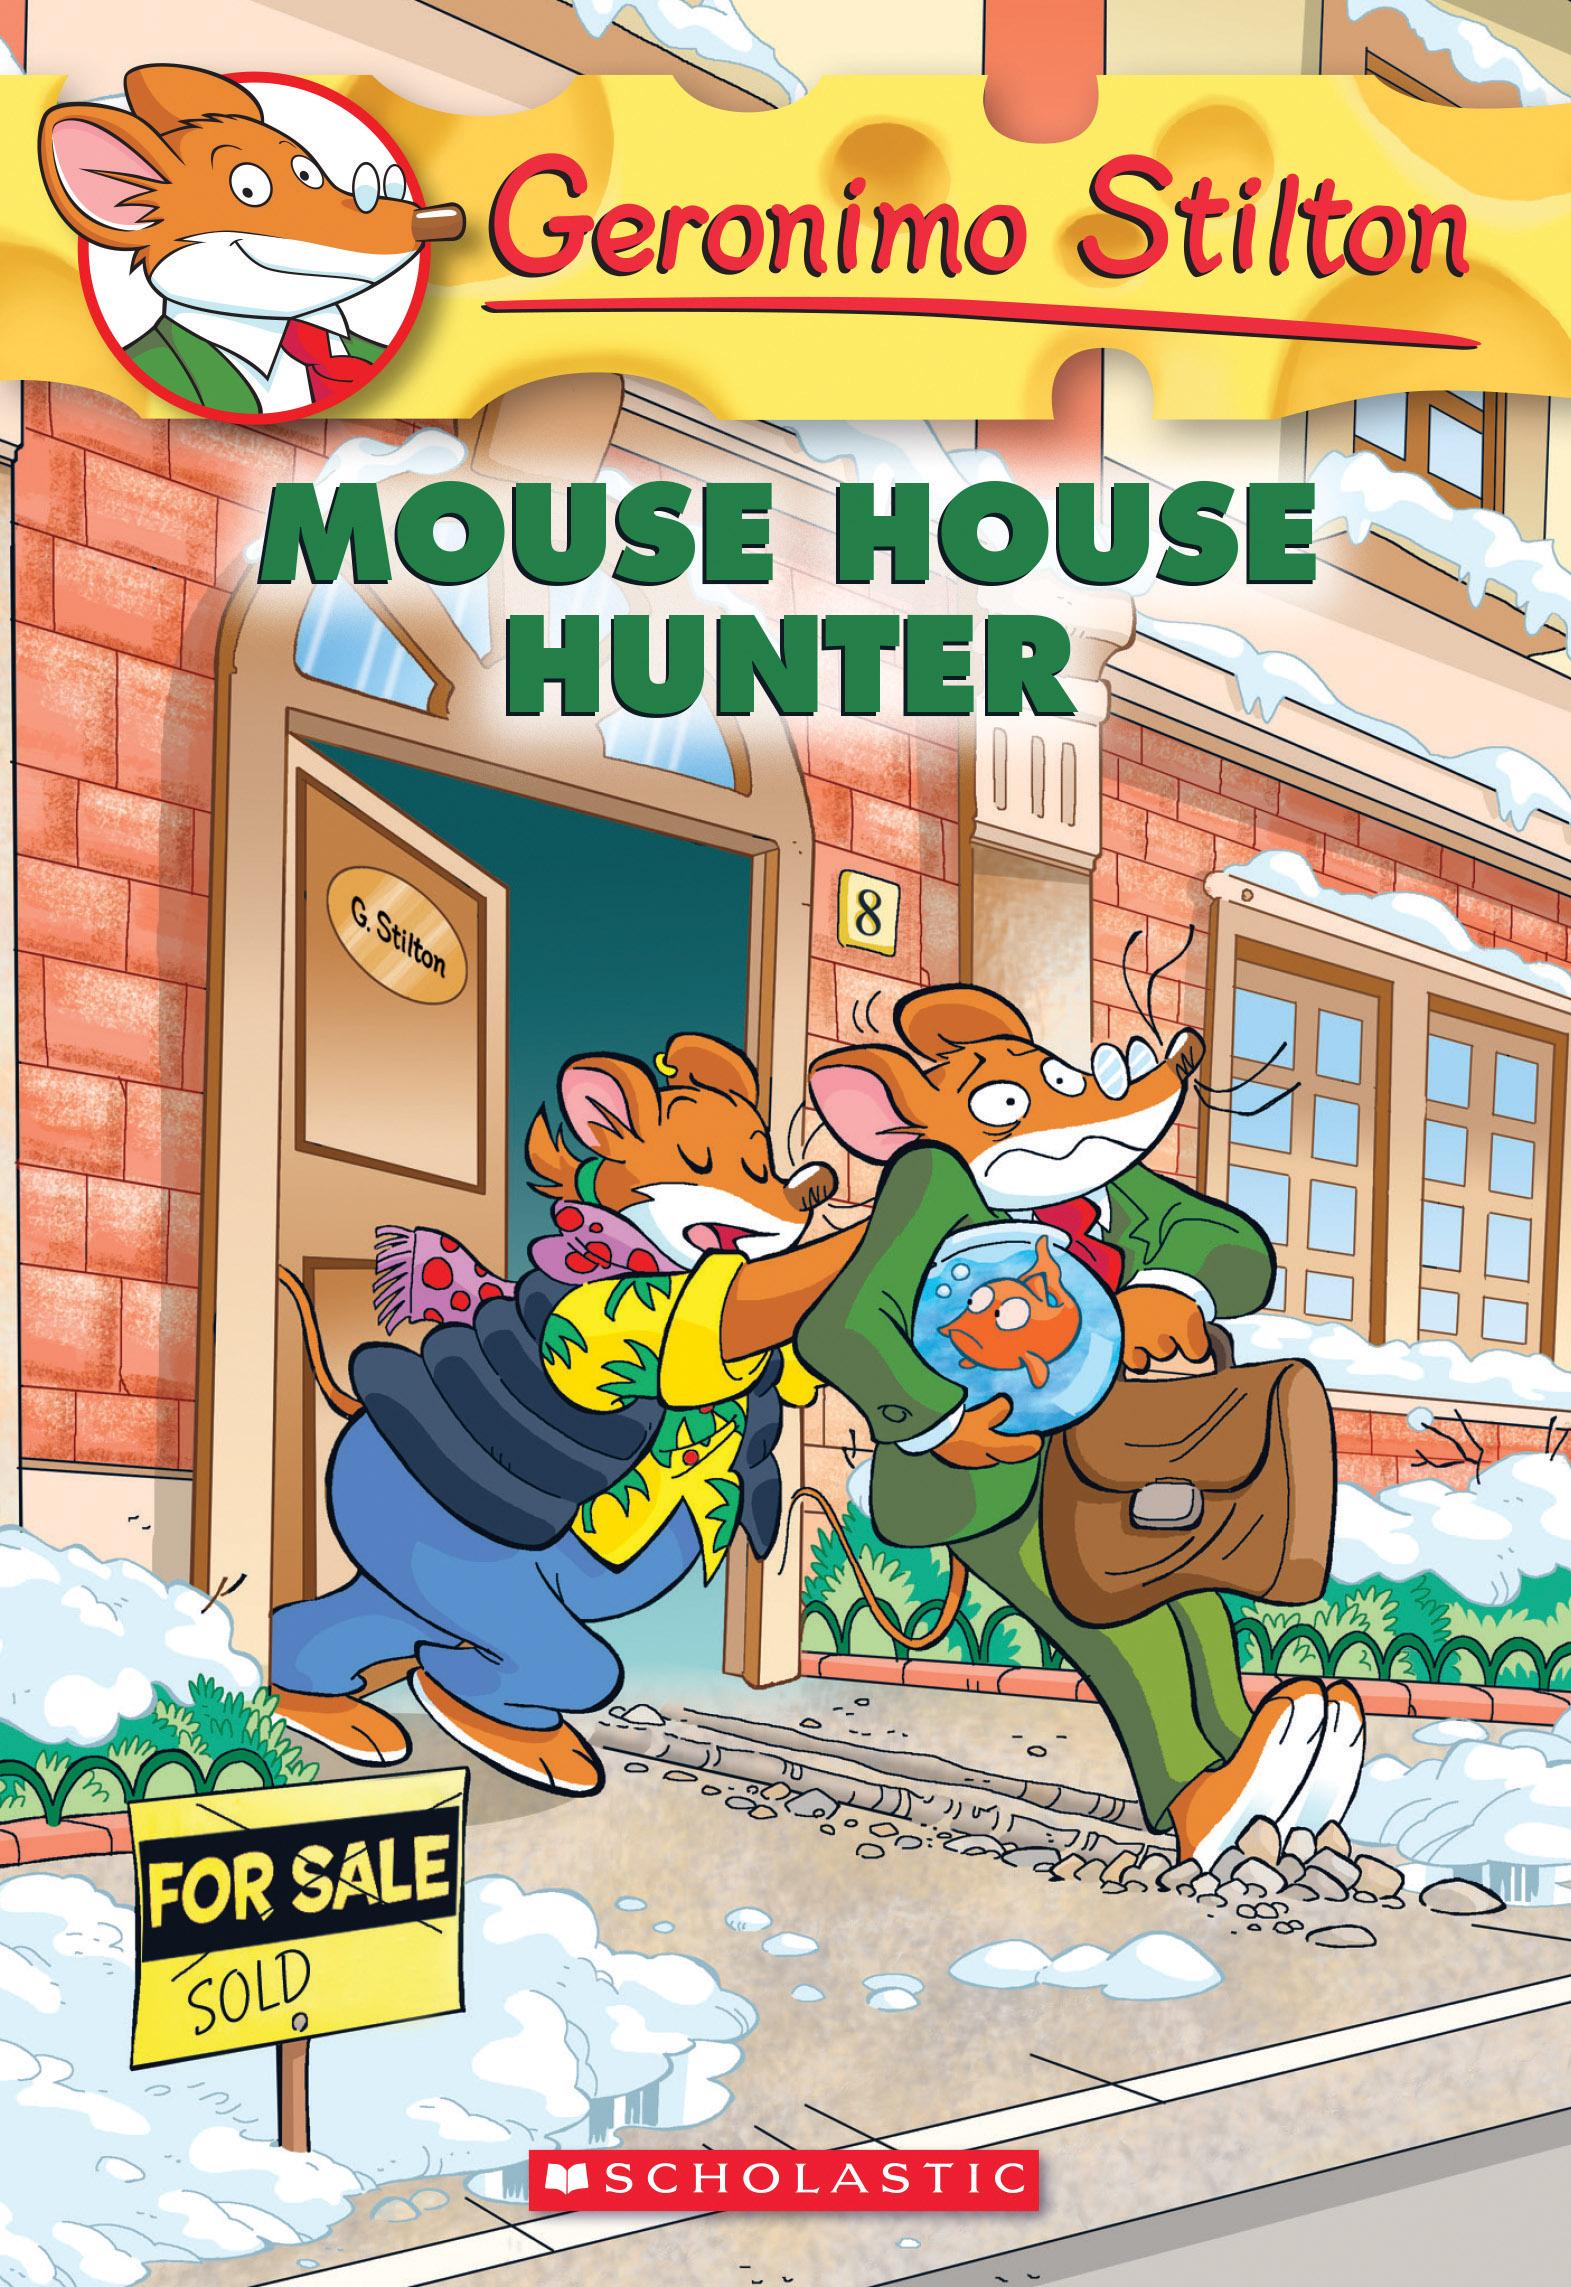 Geronimo Stilton #61: Mouse House Hunter